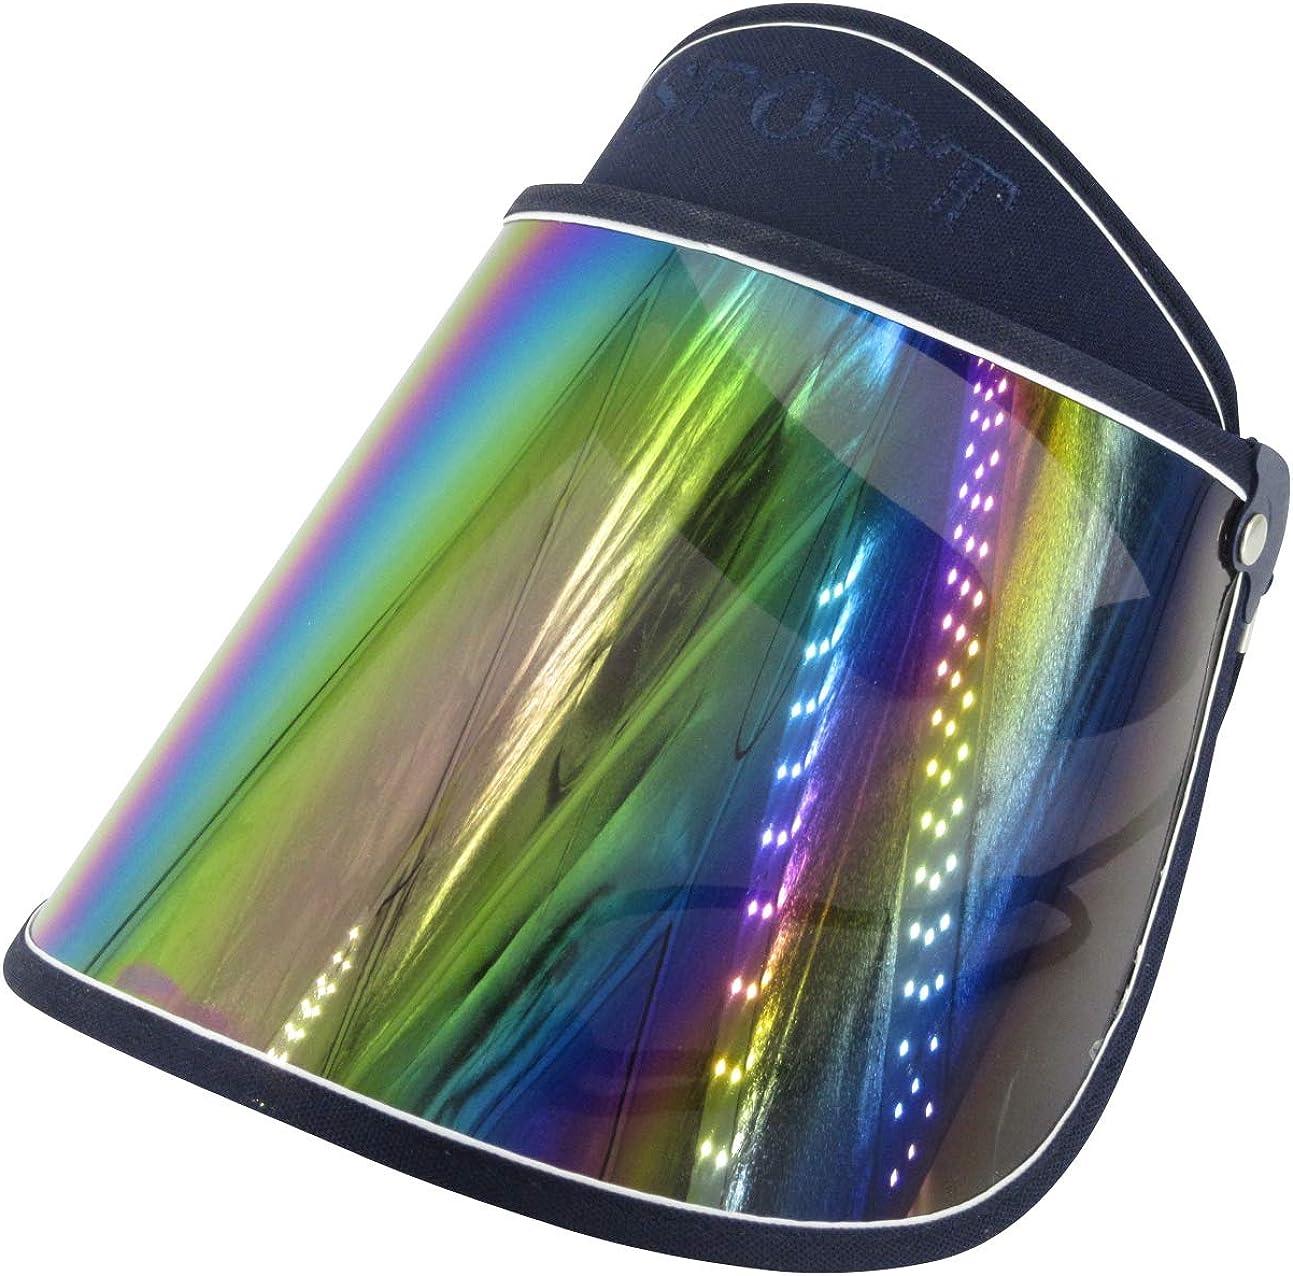 Lightweight /& Portable Unisex Visor Running Tennis Made of PVC 11 Colors Available 1 Pack Climbing Fishing SENDILI Sun Cap Ideal for Golf